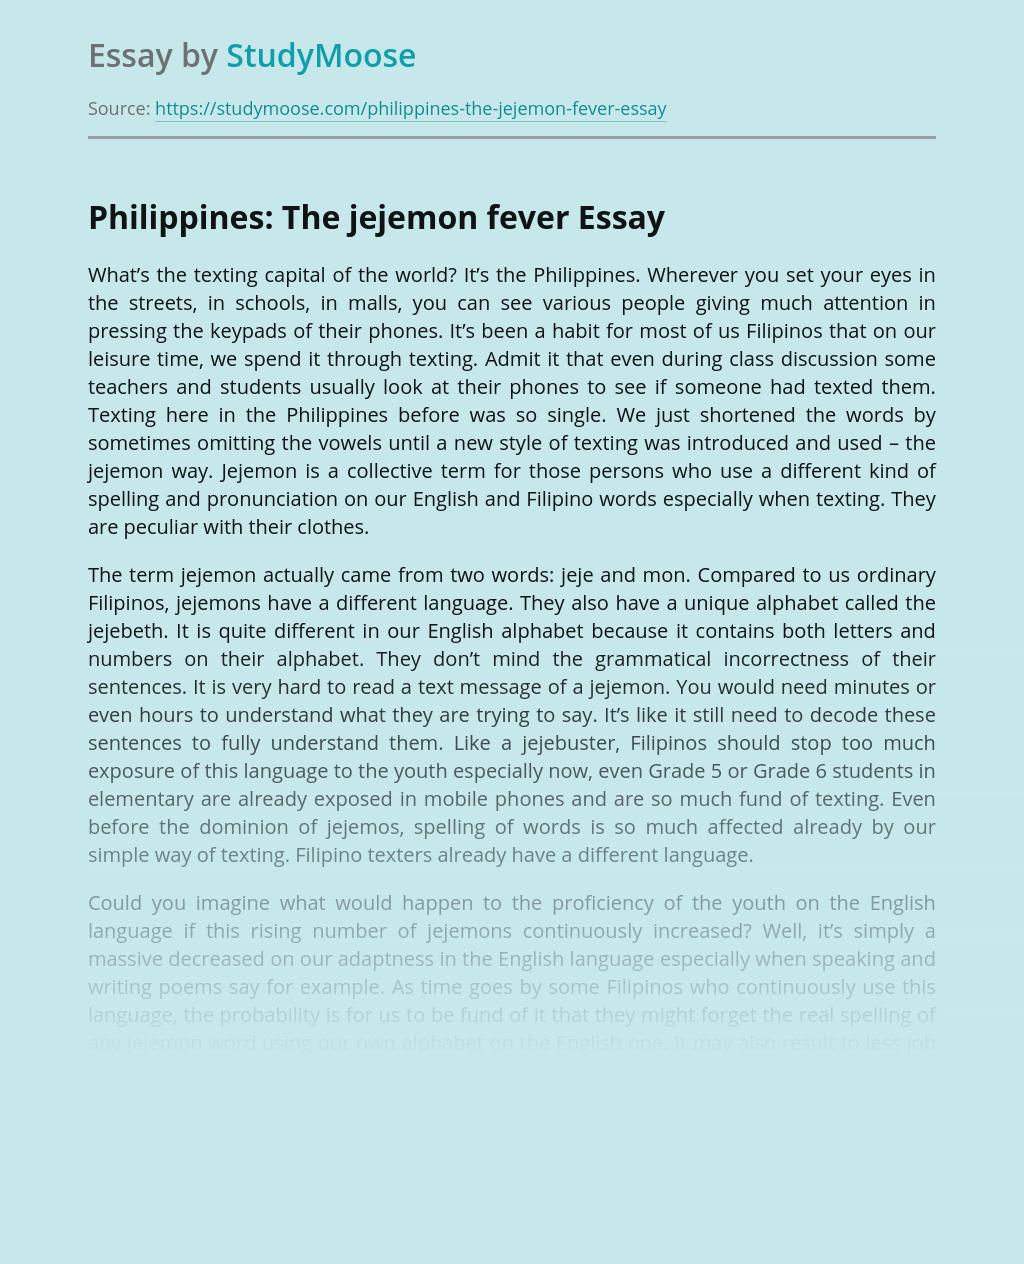 Philippines: The jejemon fever